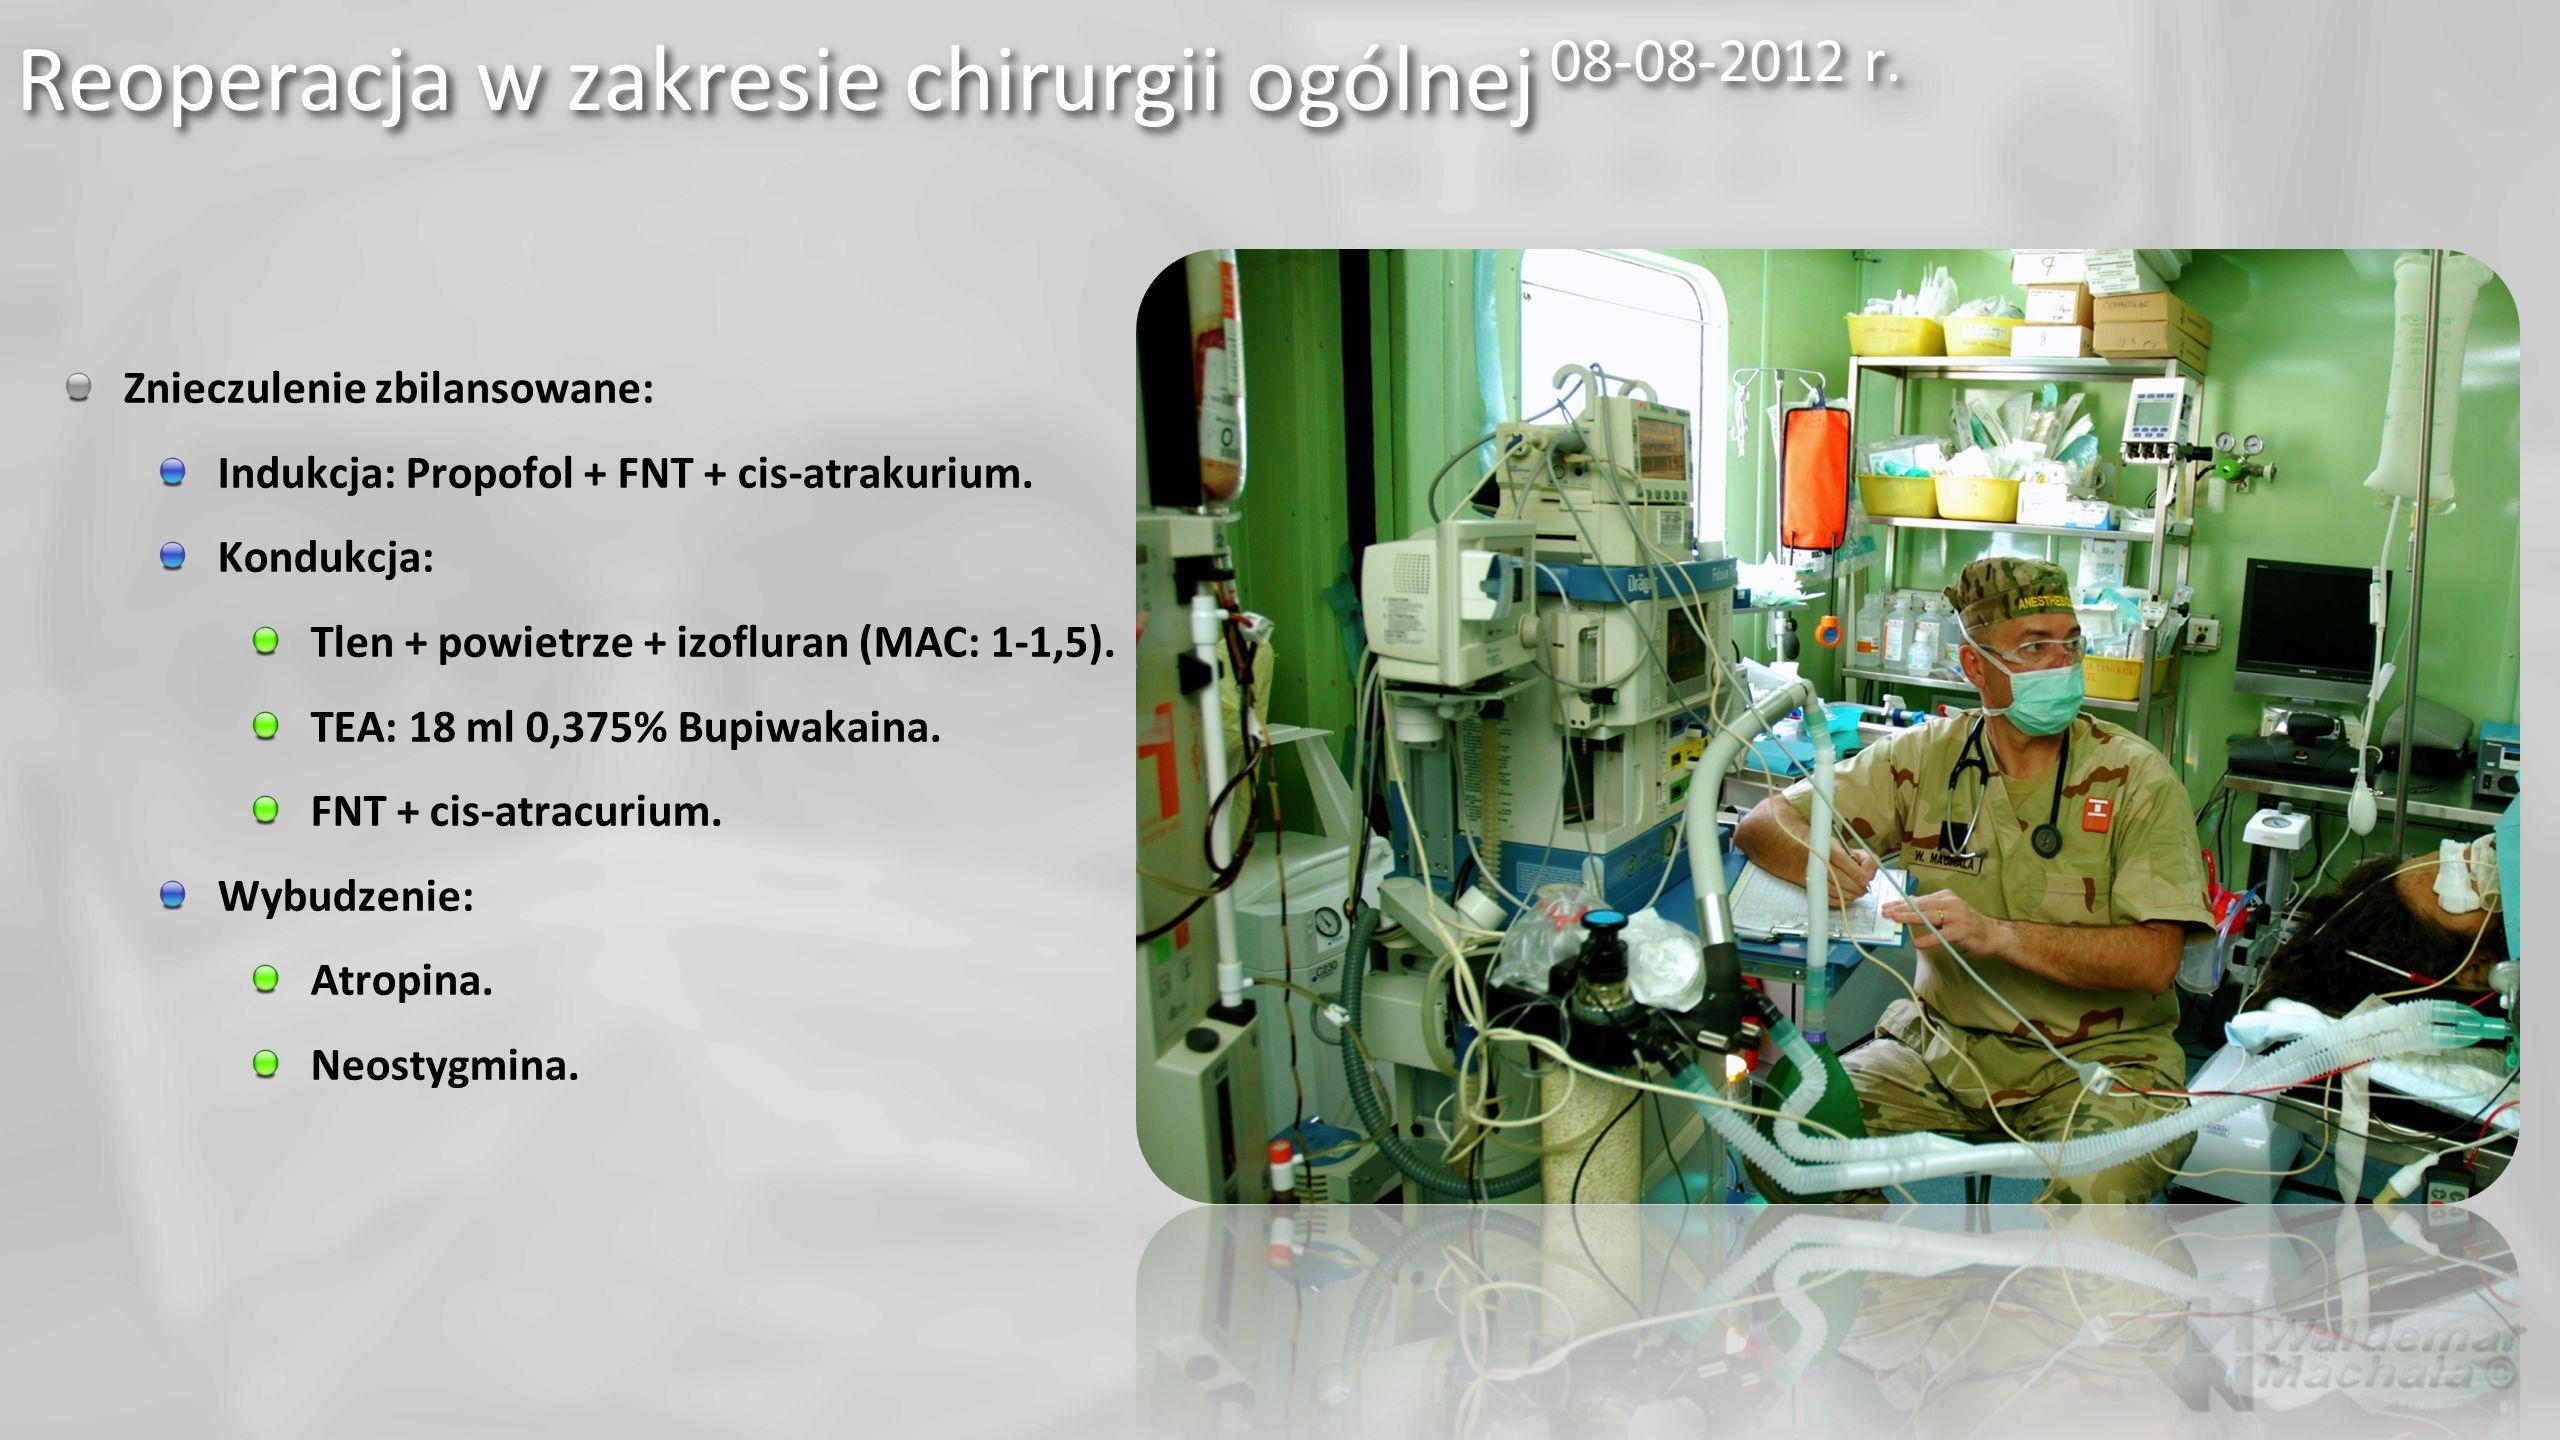 Reoperacja w zakresie chirurgii ogólnej 08-08-2012 r.